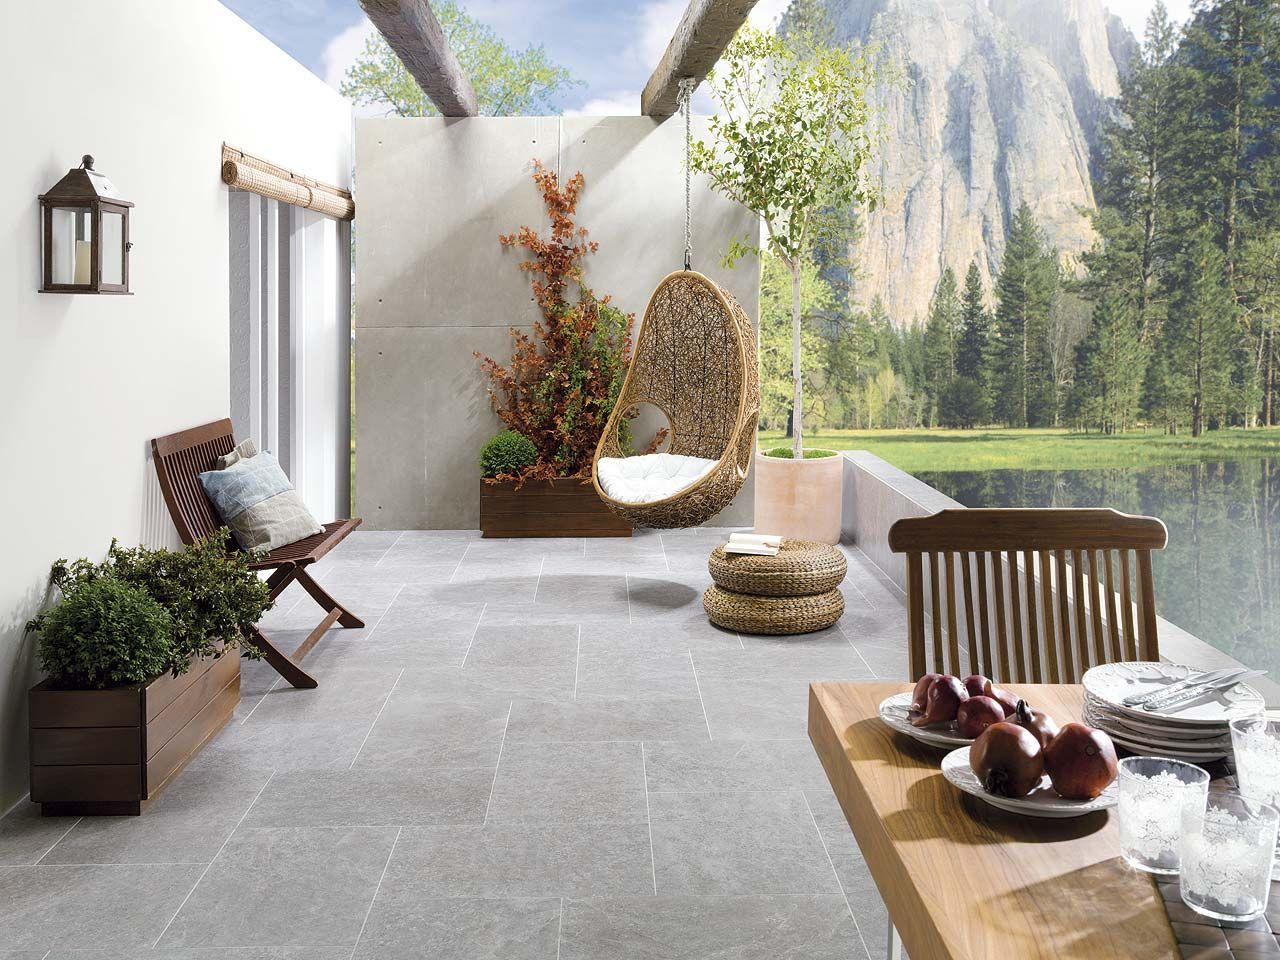 Pavimentos antideslizantes de porcelanosa para pisos y m s - Suelo antideslizante exterior ...